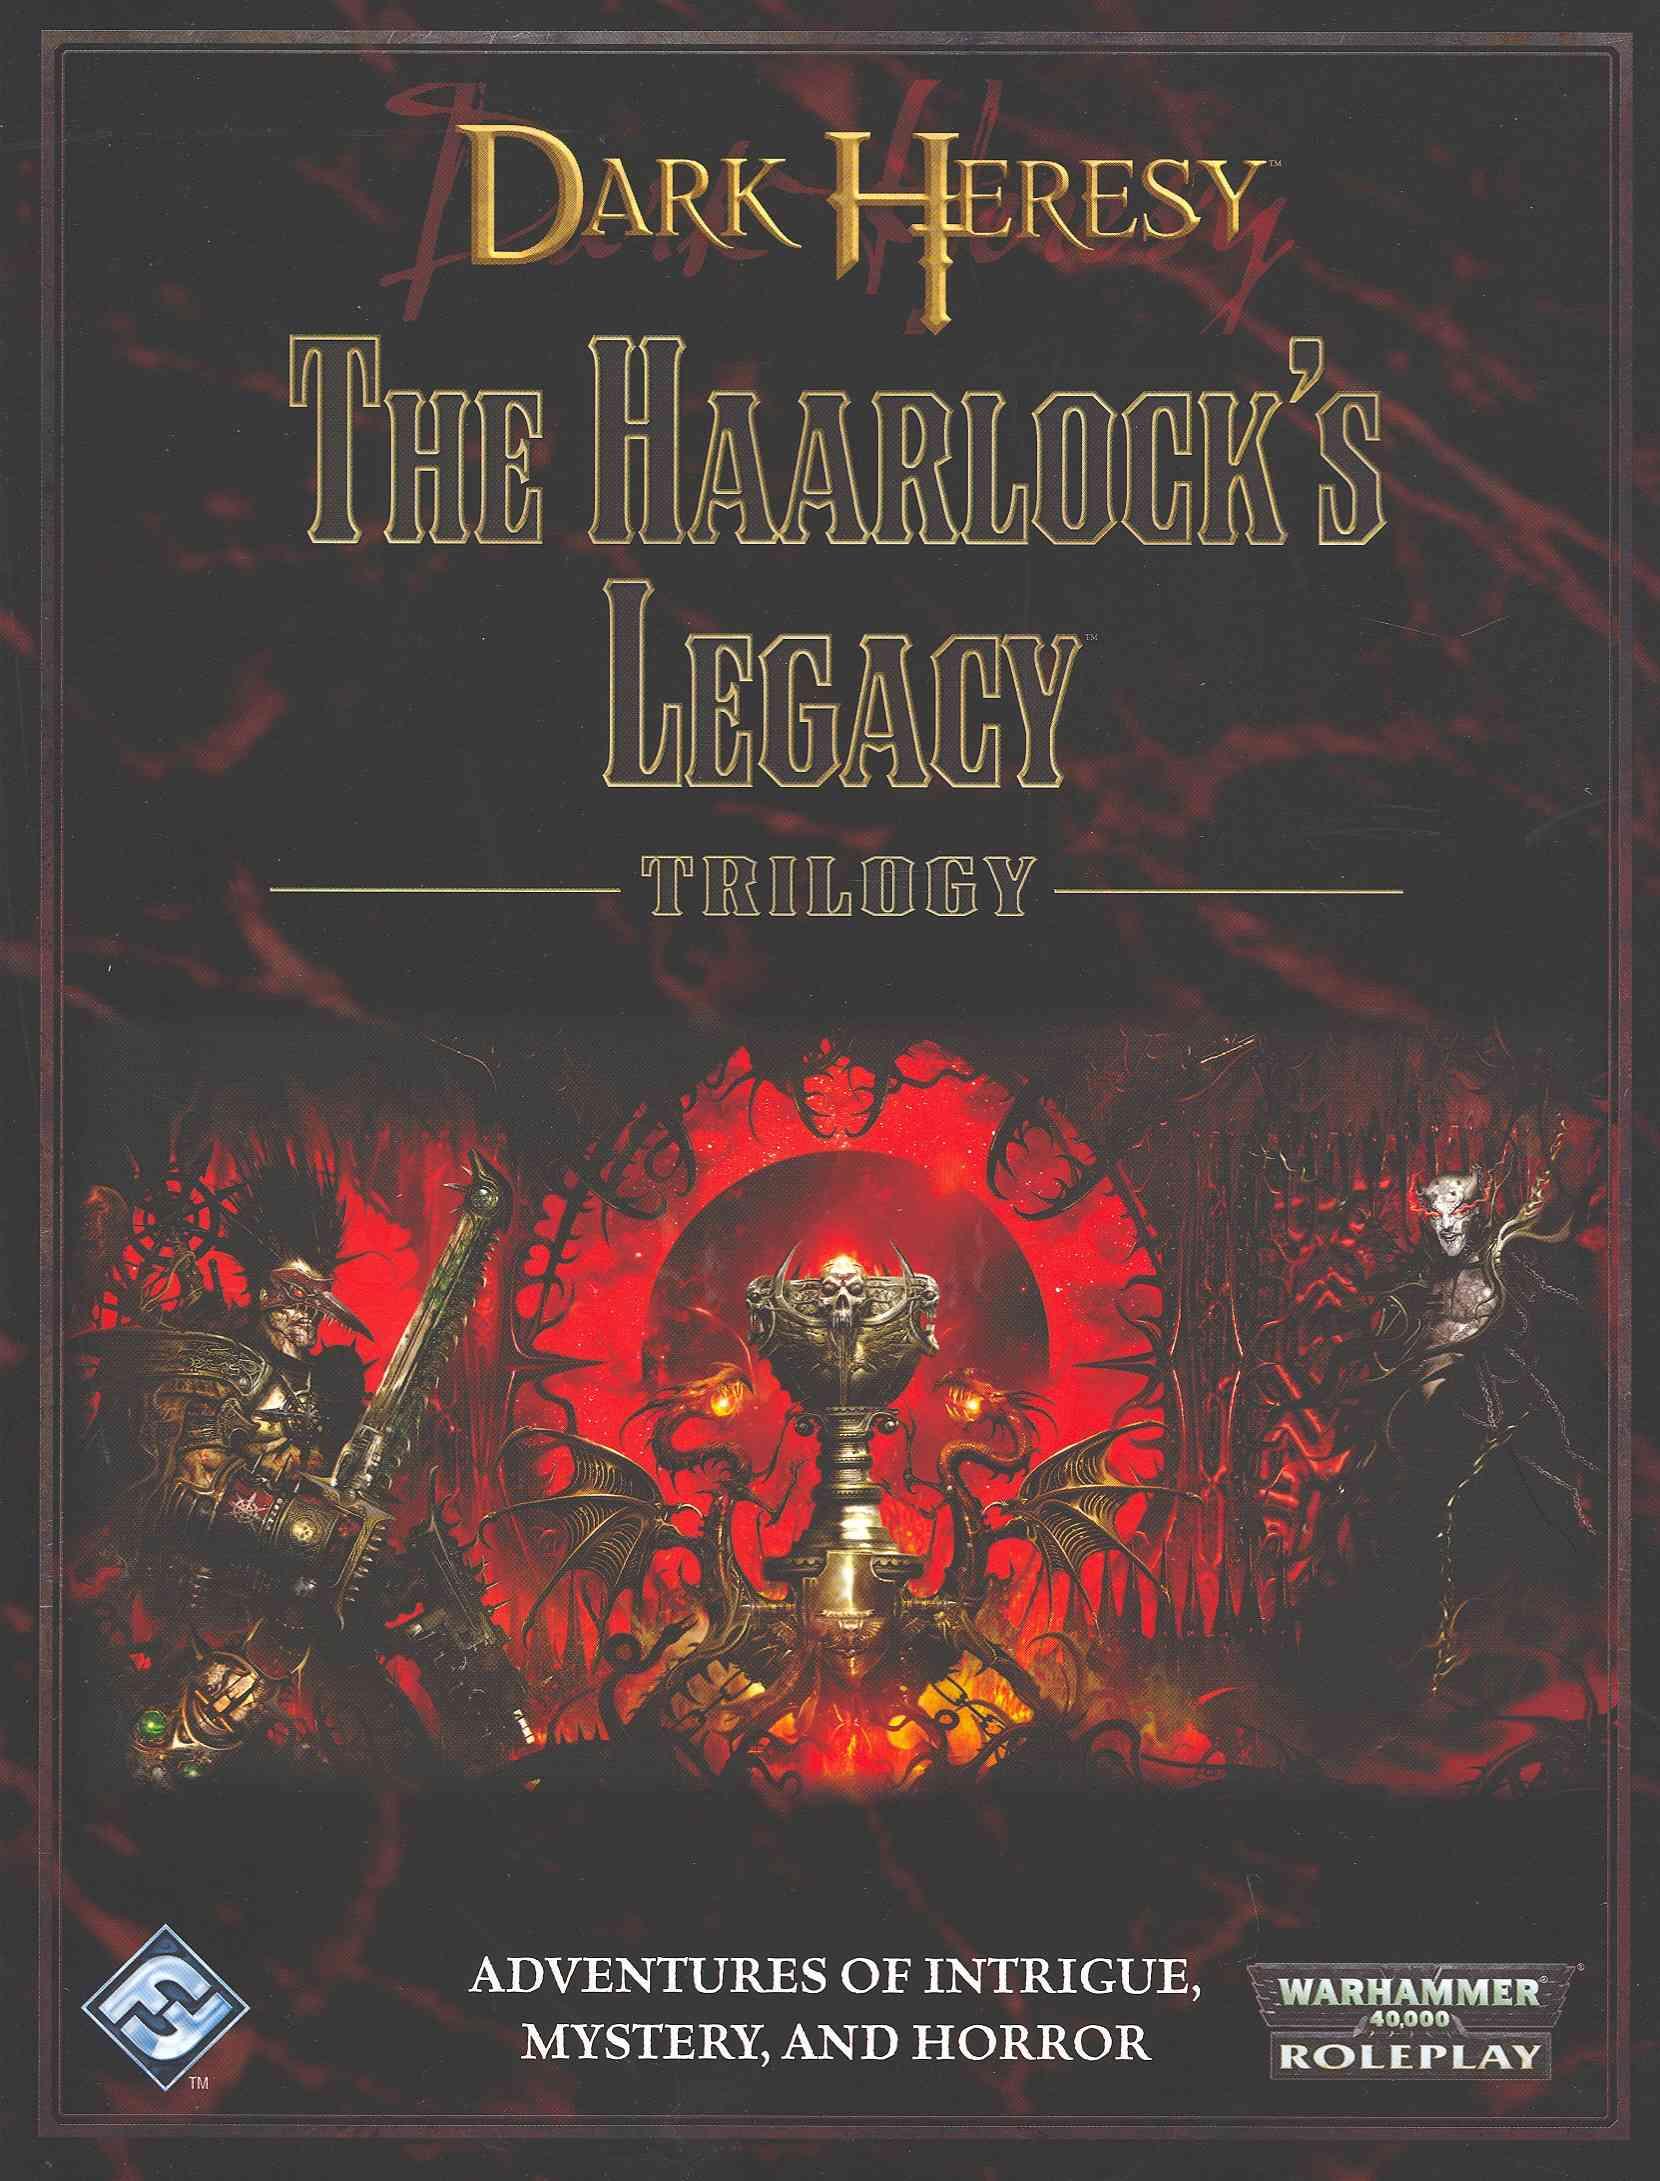 Dark Heresy: The Haarlock's Legacy (Hardcover)